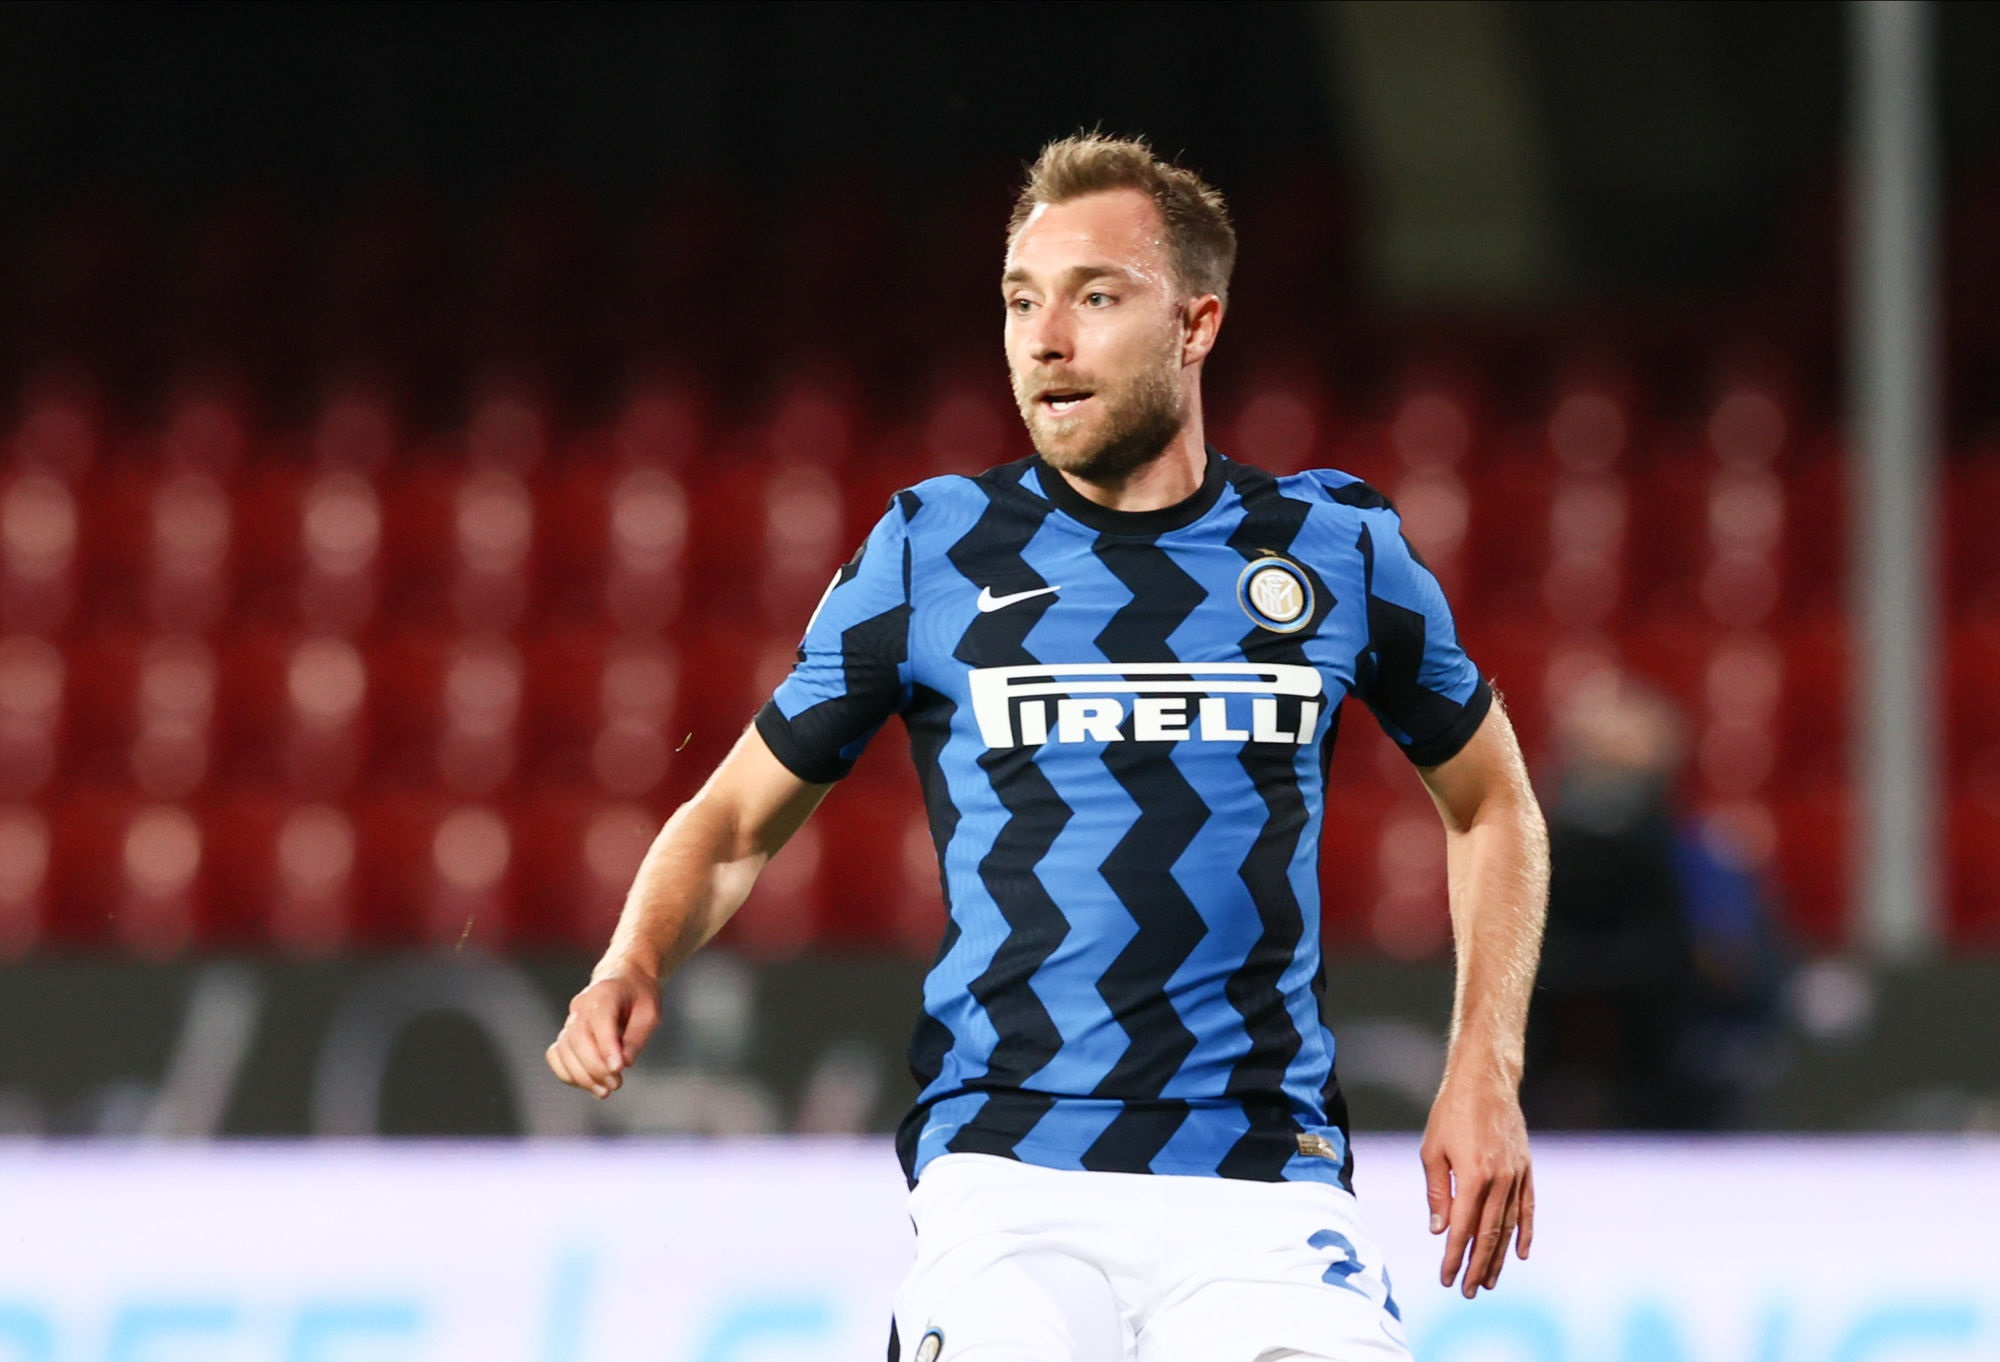 Mercato - Le PSG a fait savoir à l'Inter Milan qu'il ne recrutera pas Eriksen, annonce Di Marzio